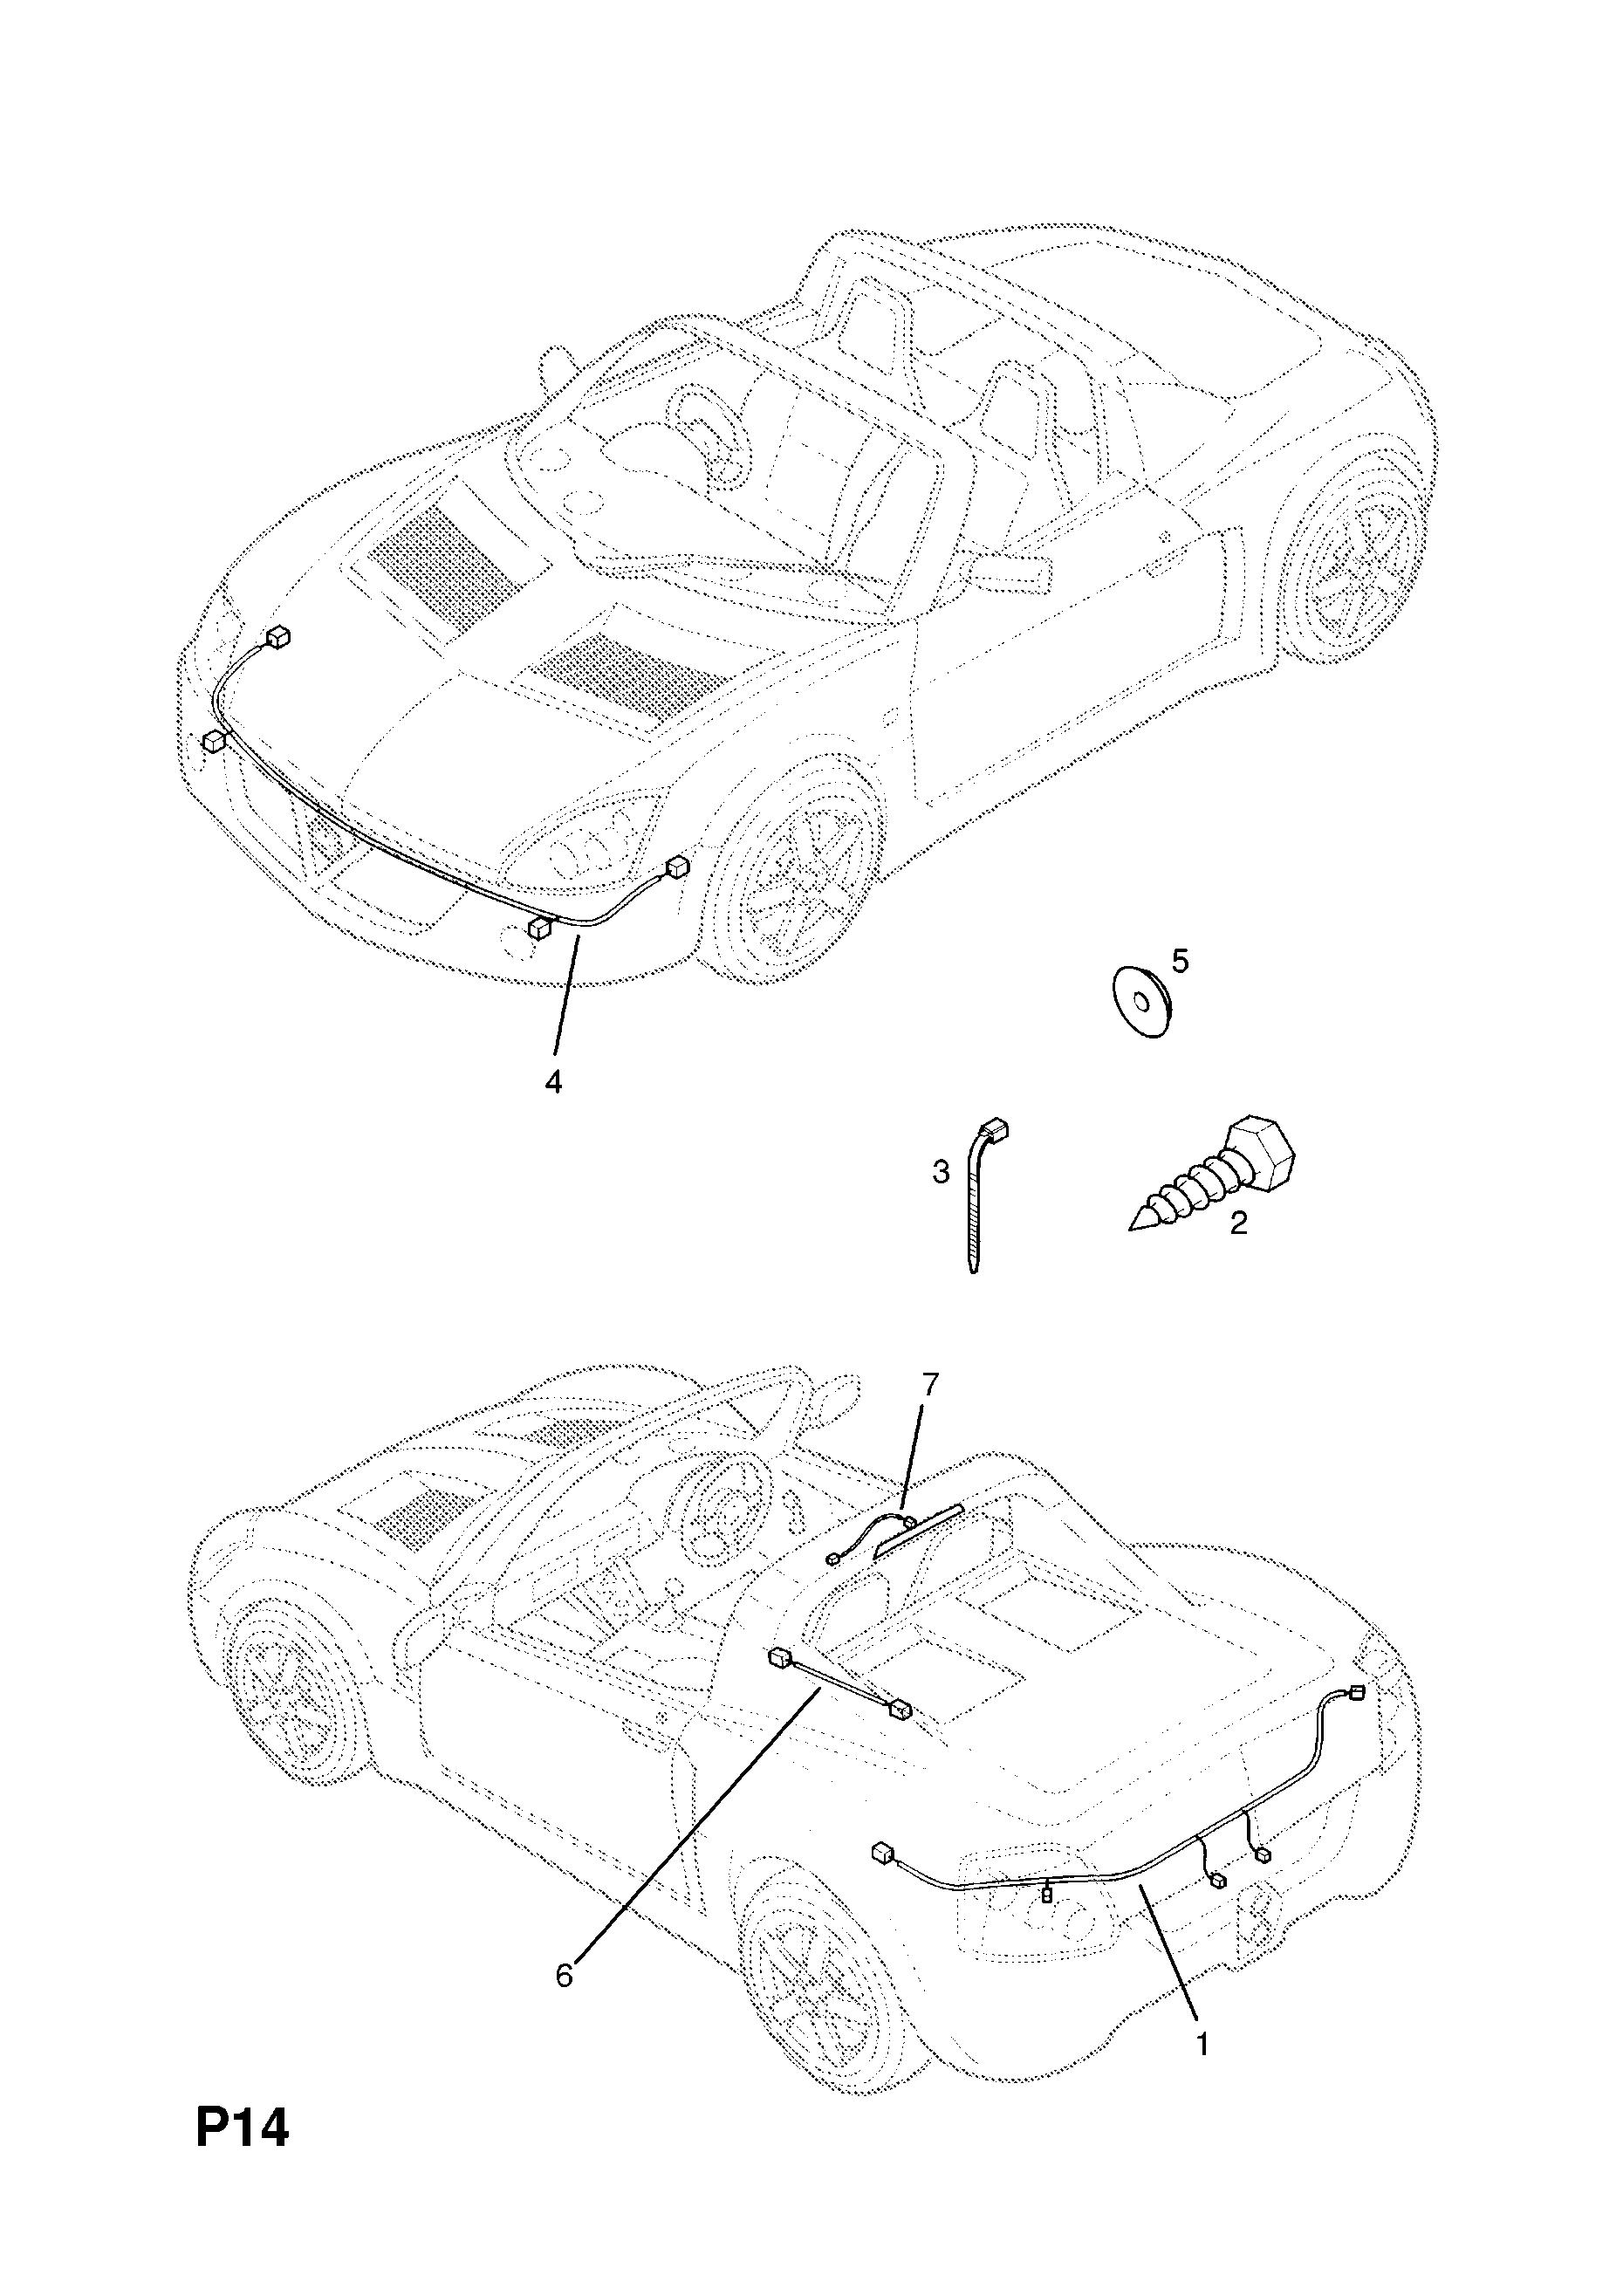 [WLLP_2054]   Opel SPEEDSTER ( 2001 - 2004), P ELECTRICAL, 8 WIRING HARNESS, 10.HANDBRAKE  SWITCH HARNESS - Catcar.info | Opel Speedster Wiring Diagram |  | CATCAR.INFO